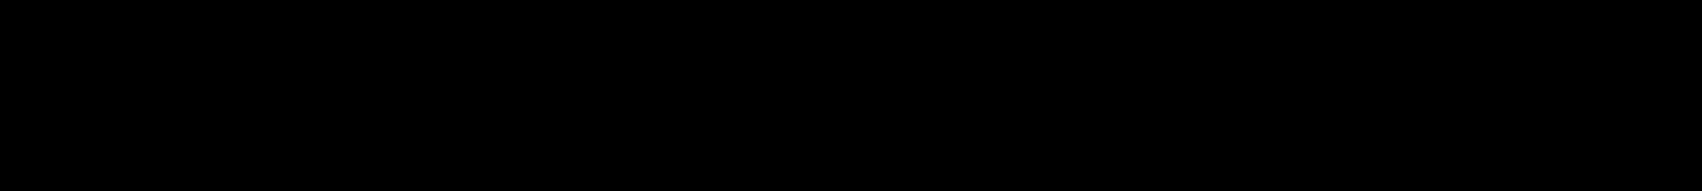 Korataki Book Italic